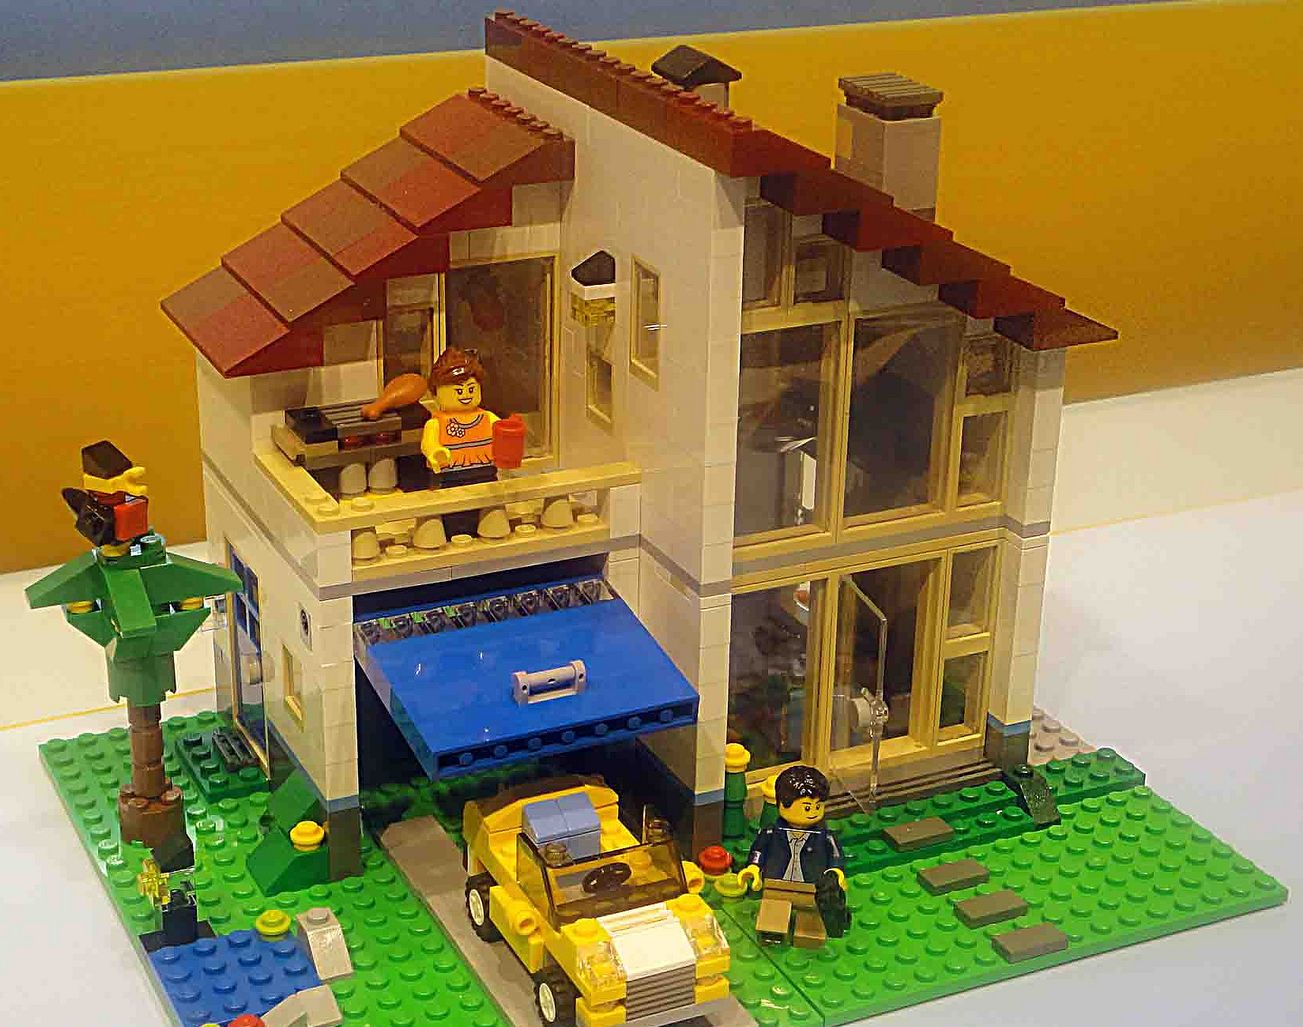 DeToyz Shop: Lego Creator - 31012 Family House